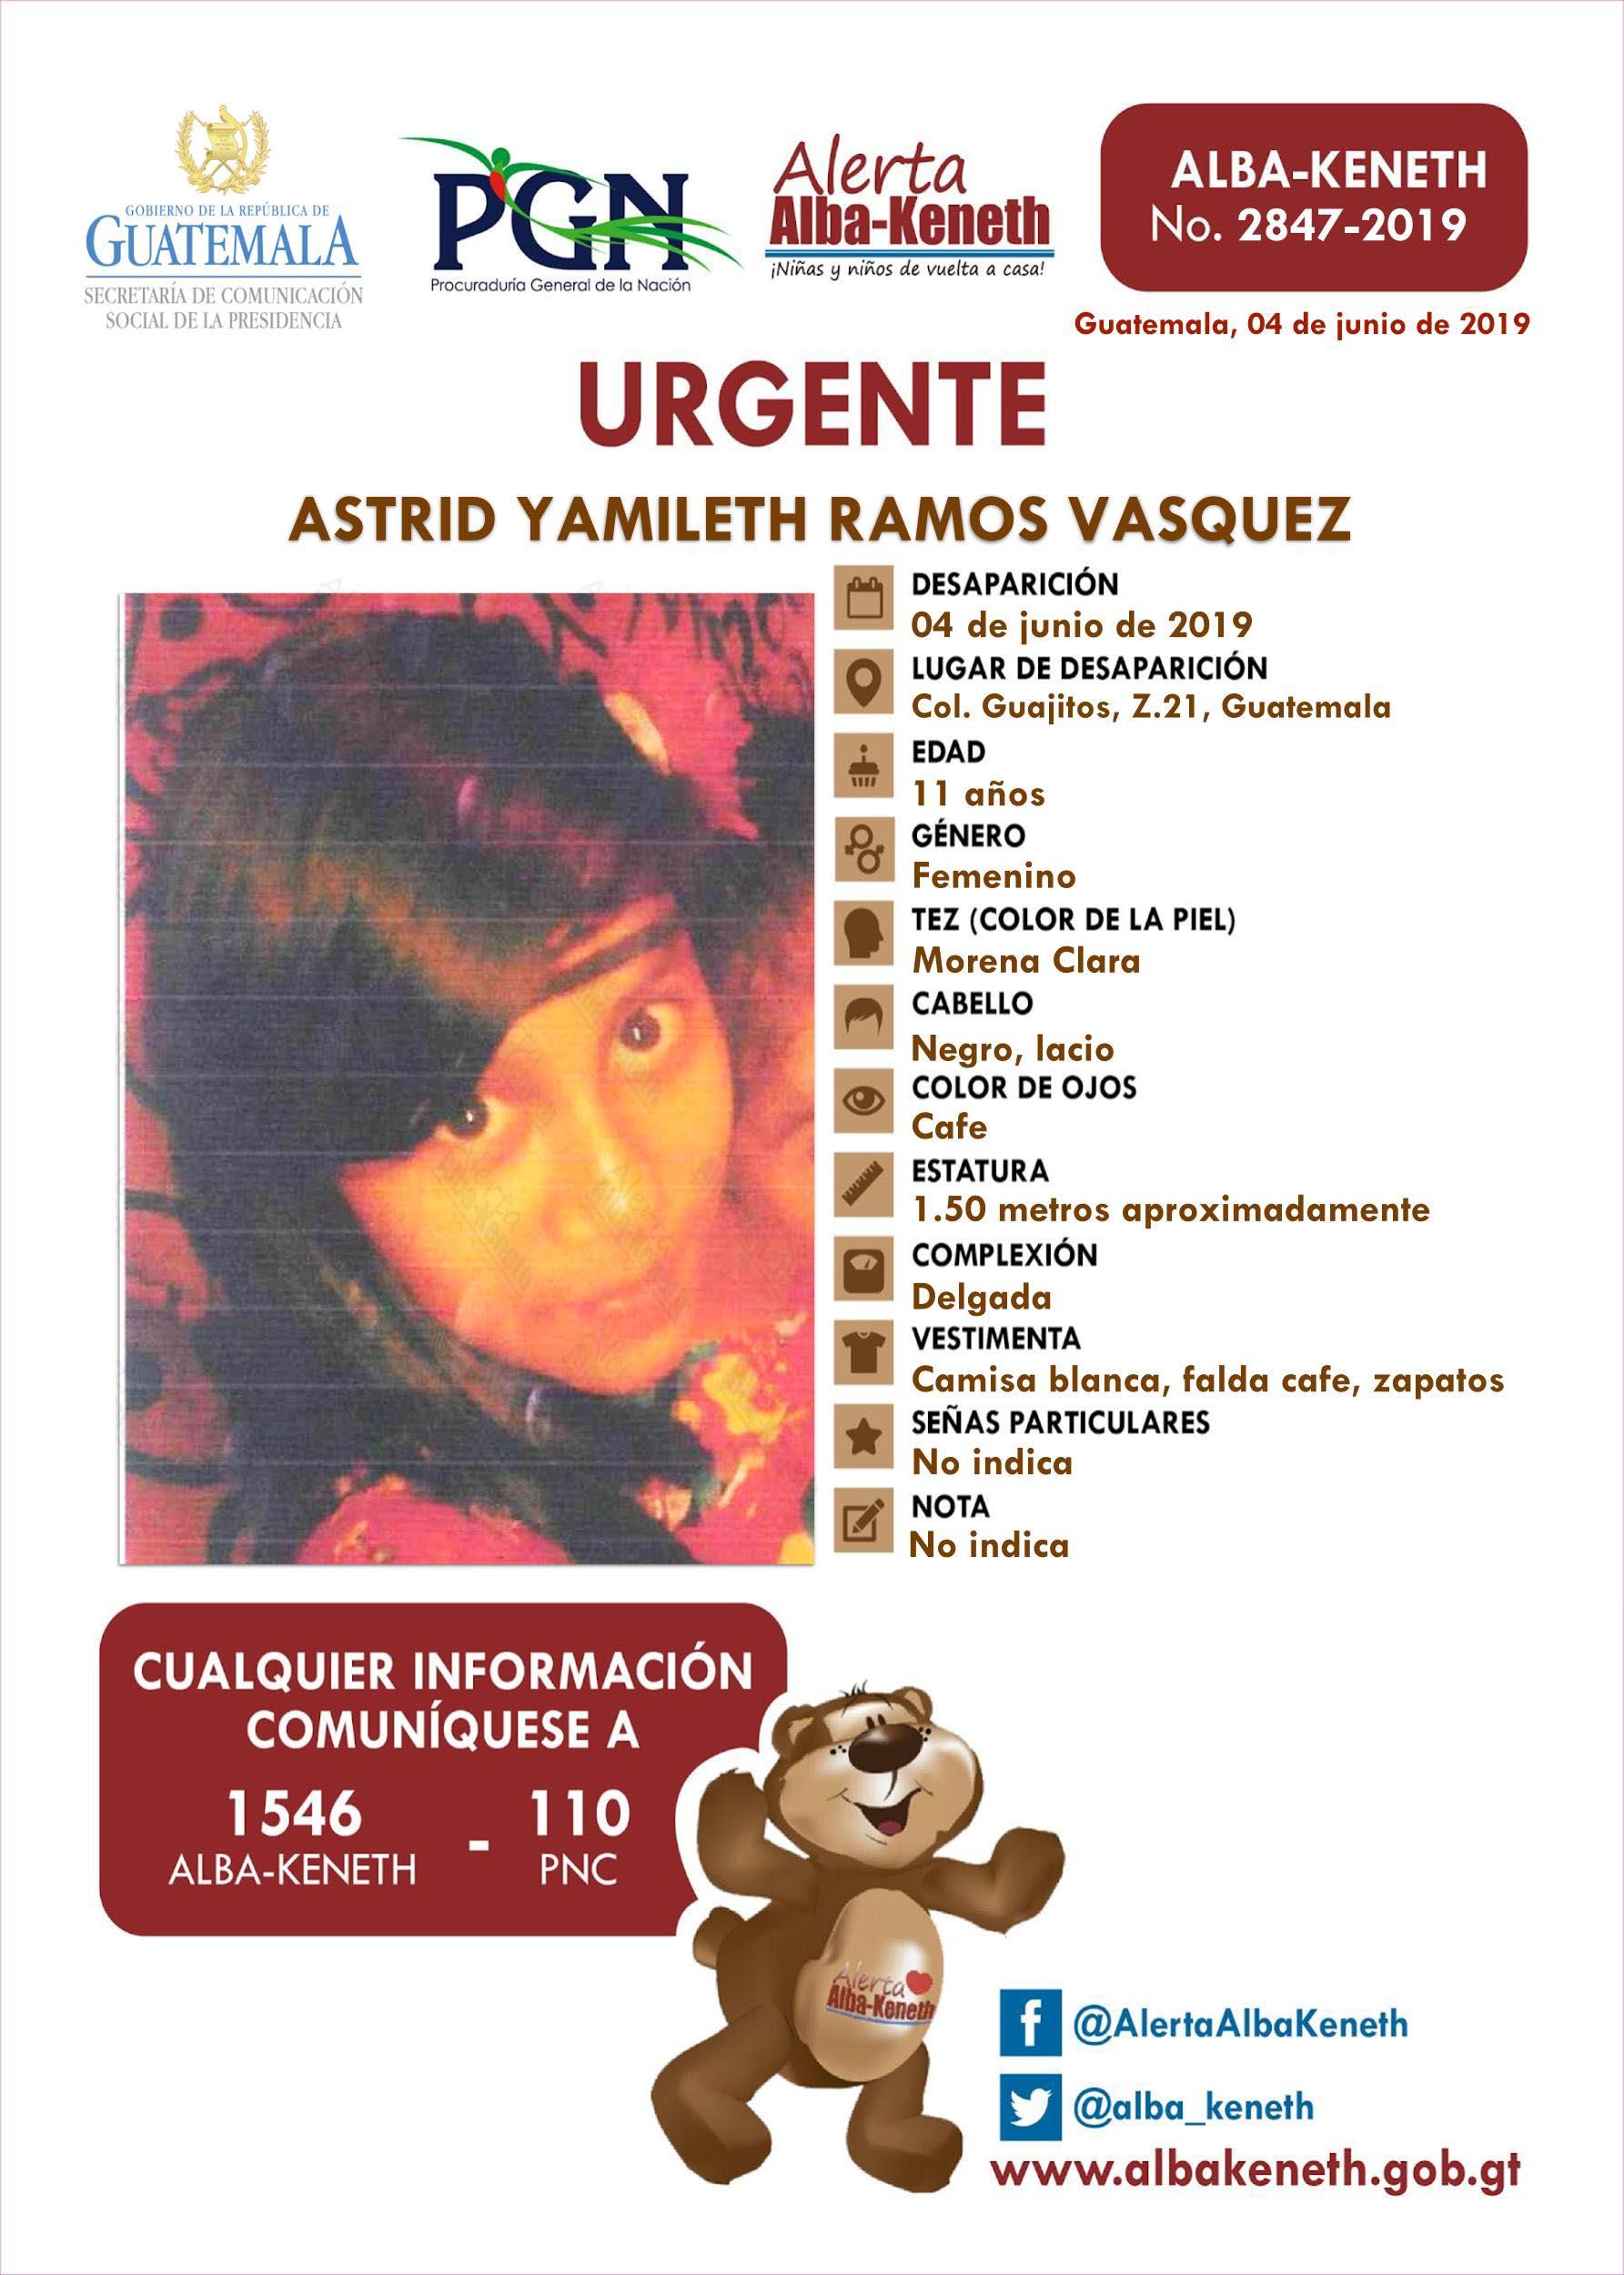 Astrid Yamileth Ramos Vasquez